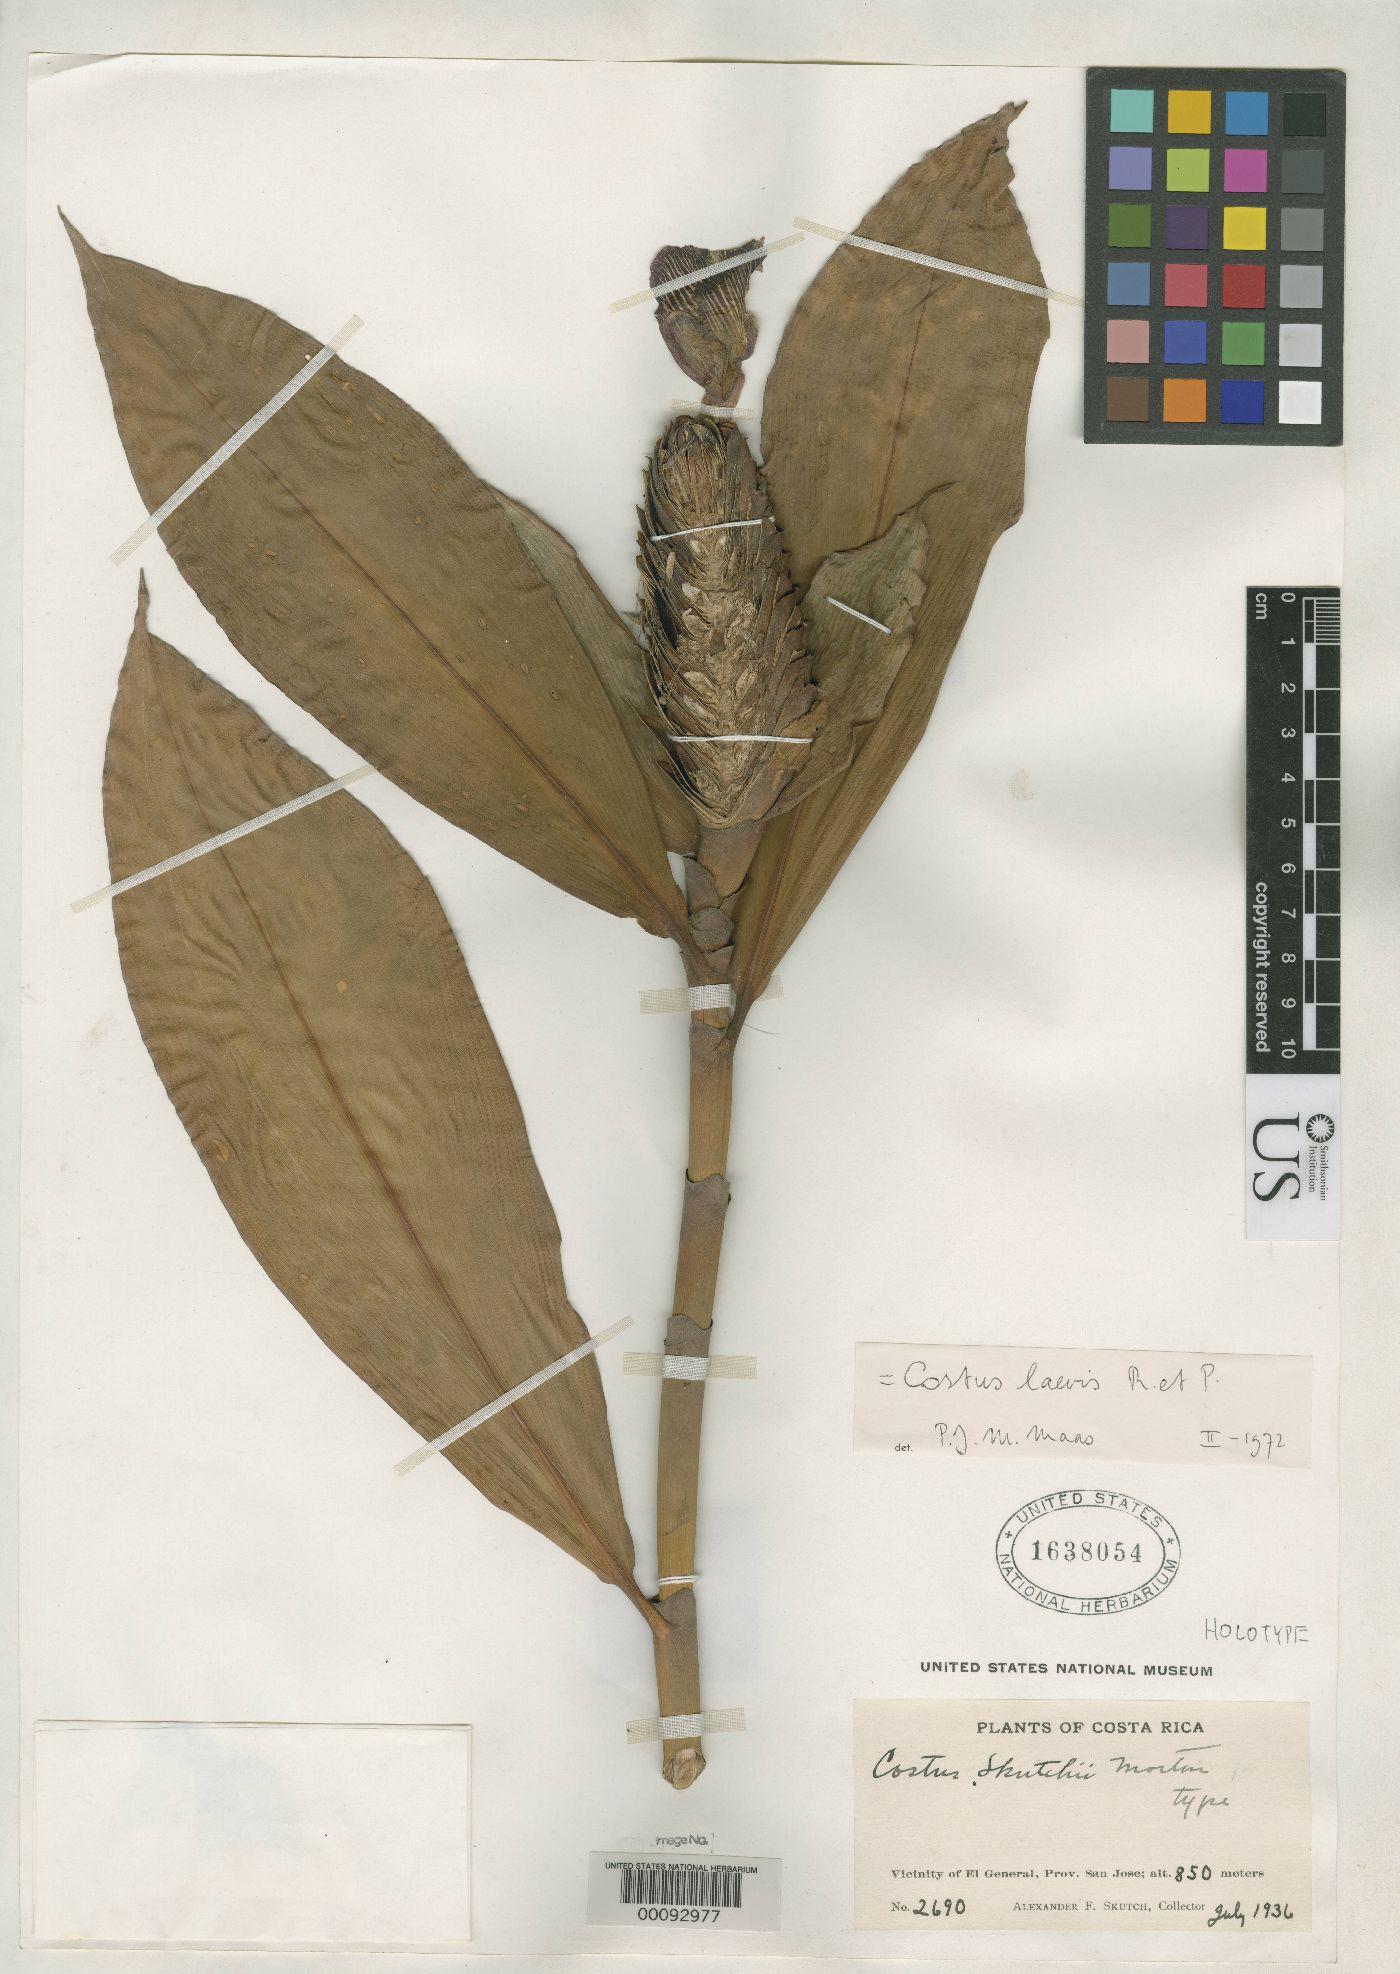 Photo# 17977 - Herbarium sheet, Costus skutchii at USNH